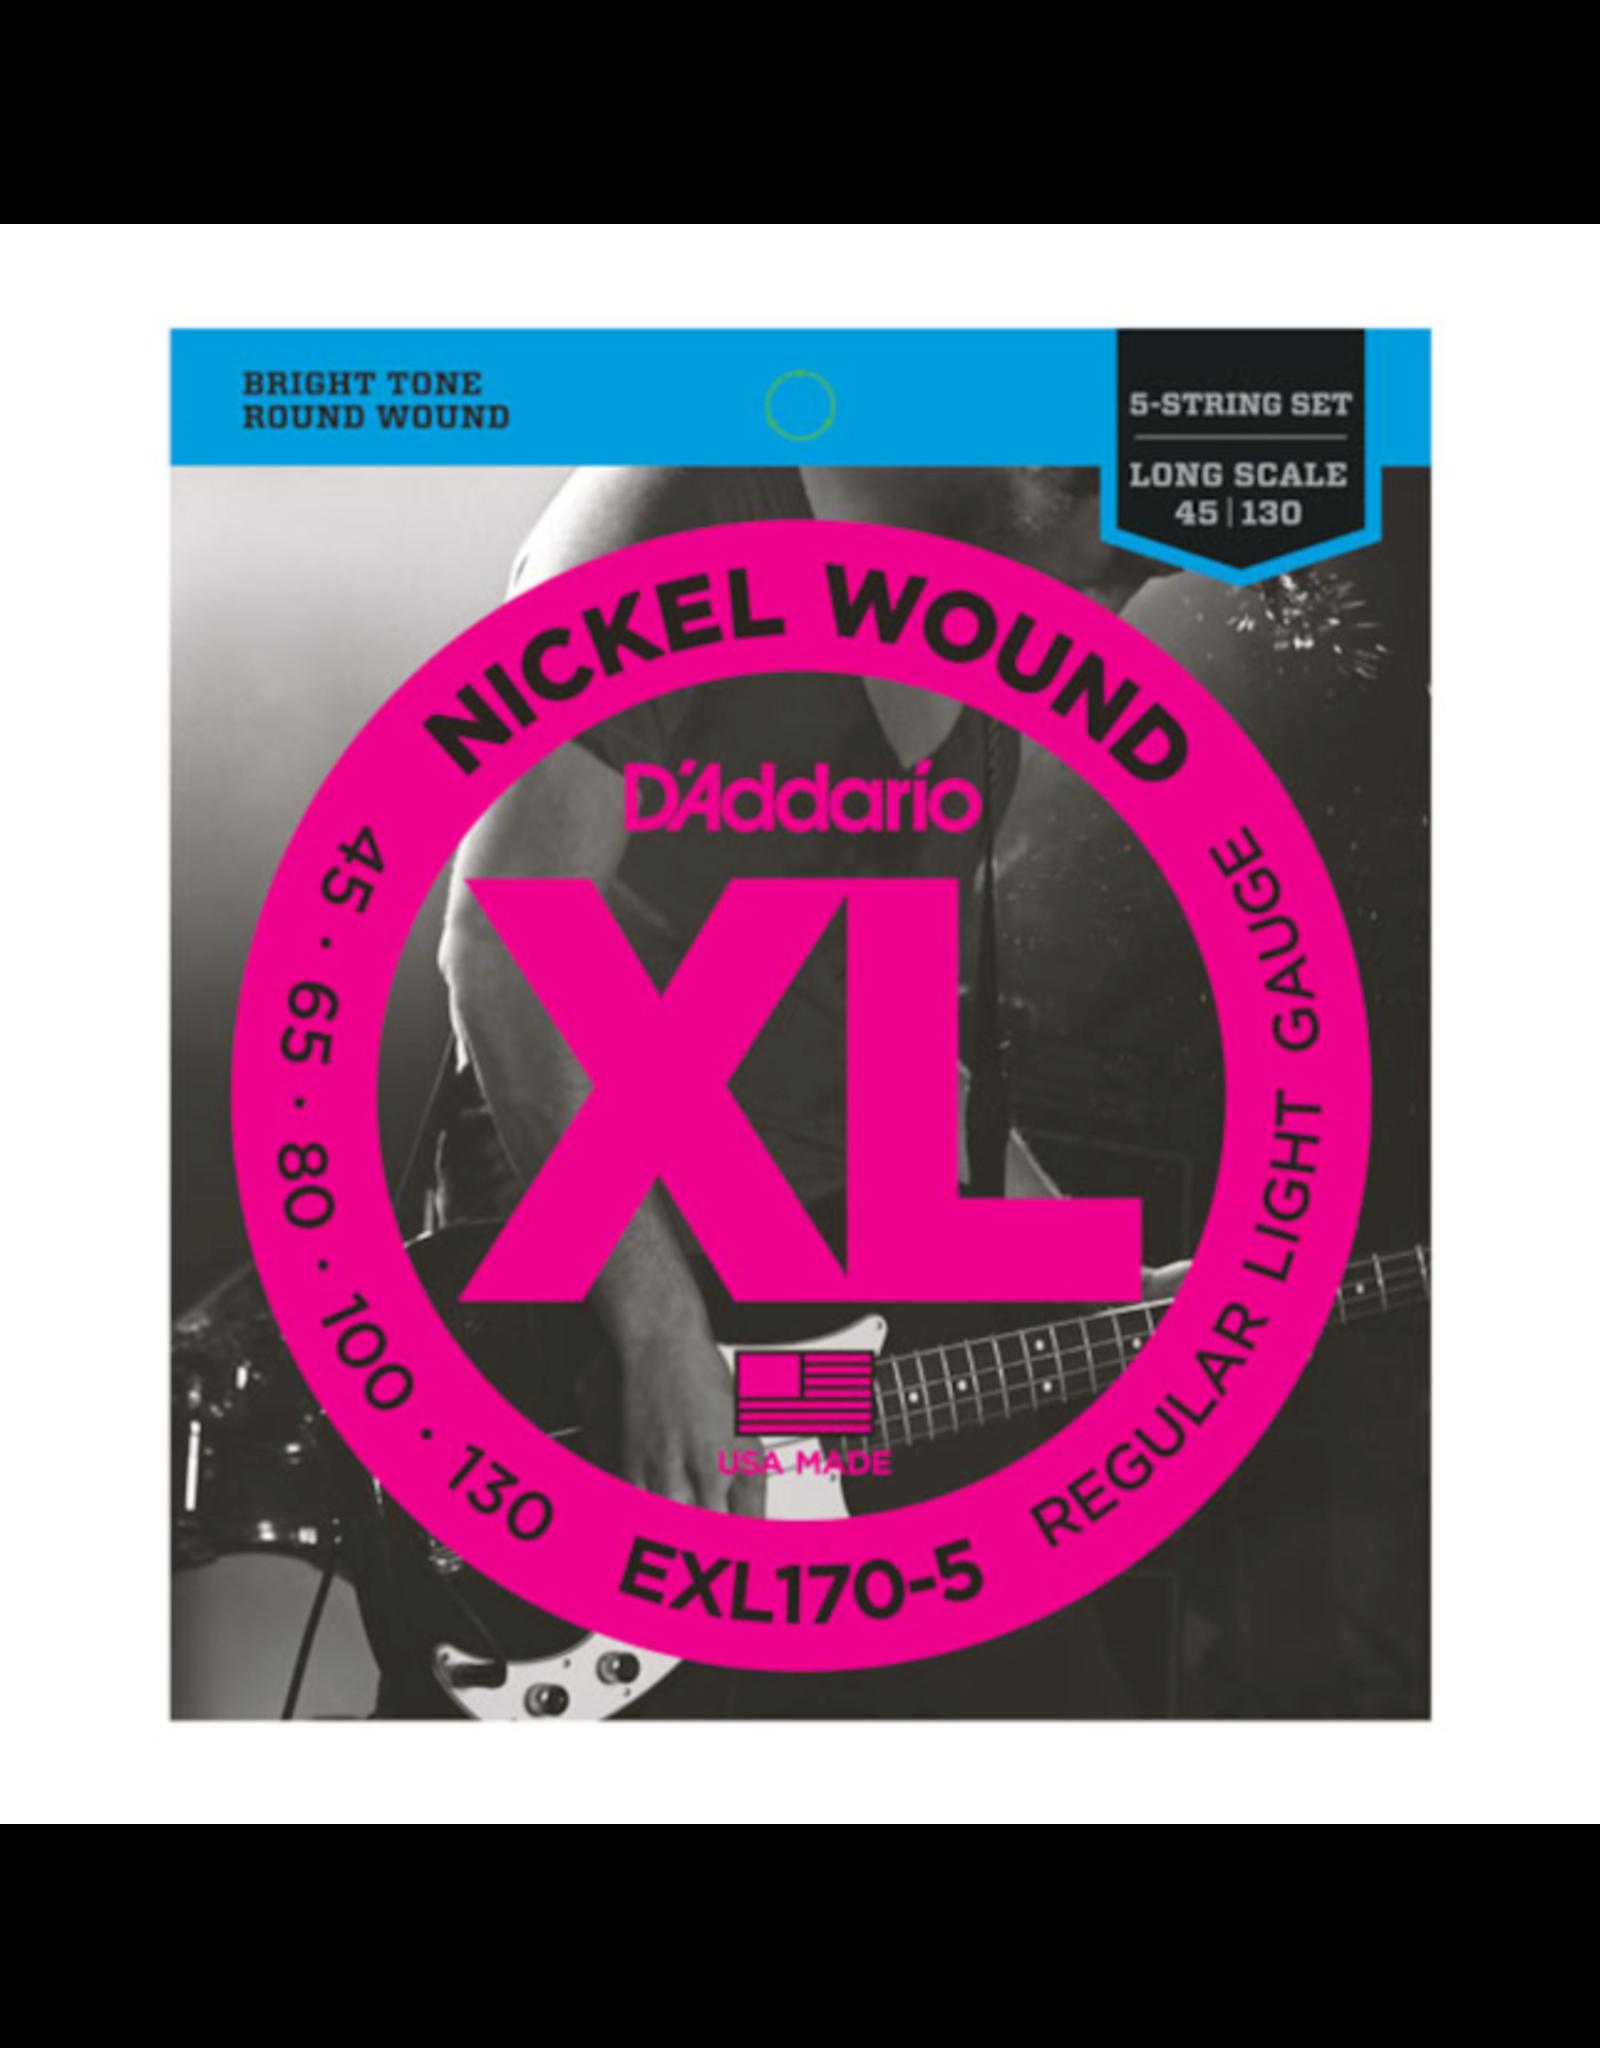 D'Addario D'Addario EXL170-5 45-130